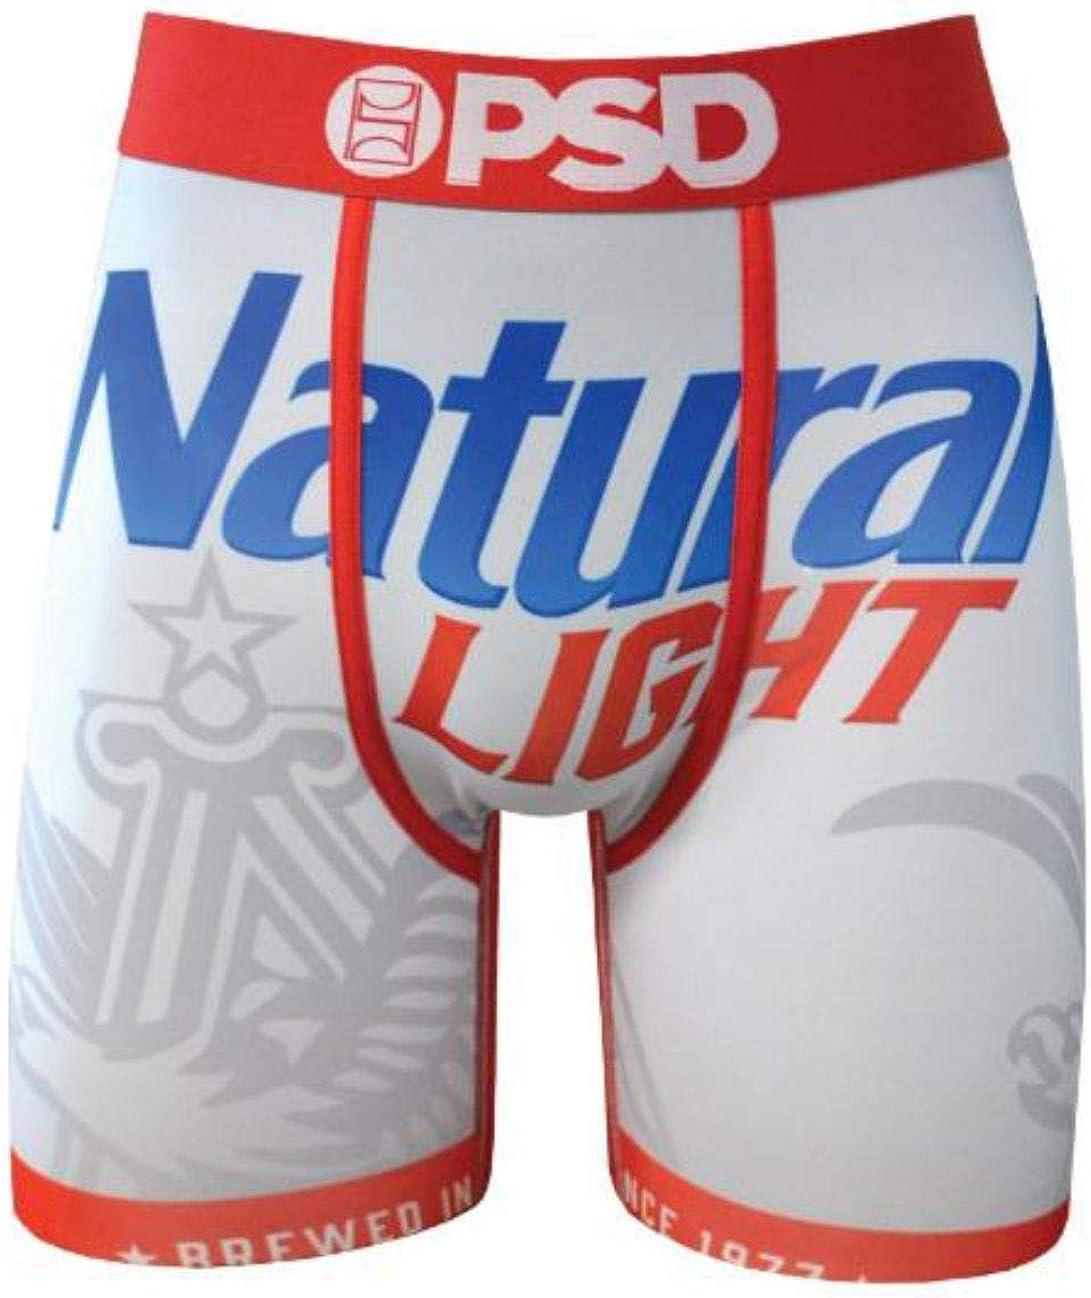 PSD Men's E - Natty Light Boxer Brief Underwear